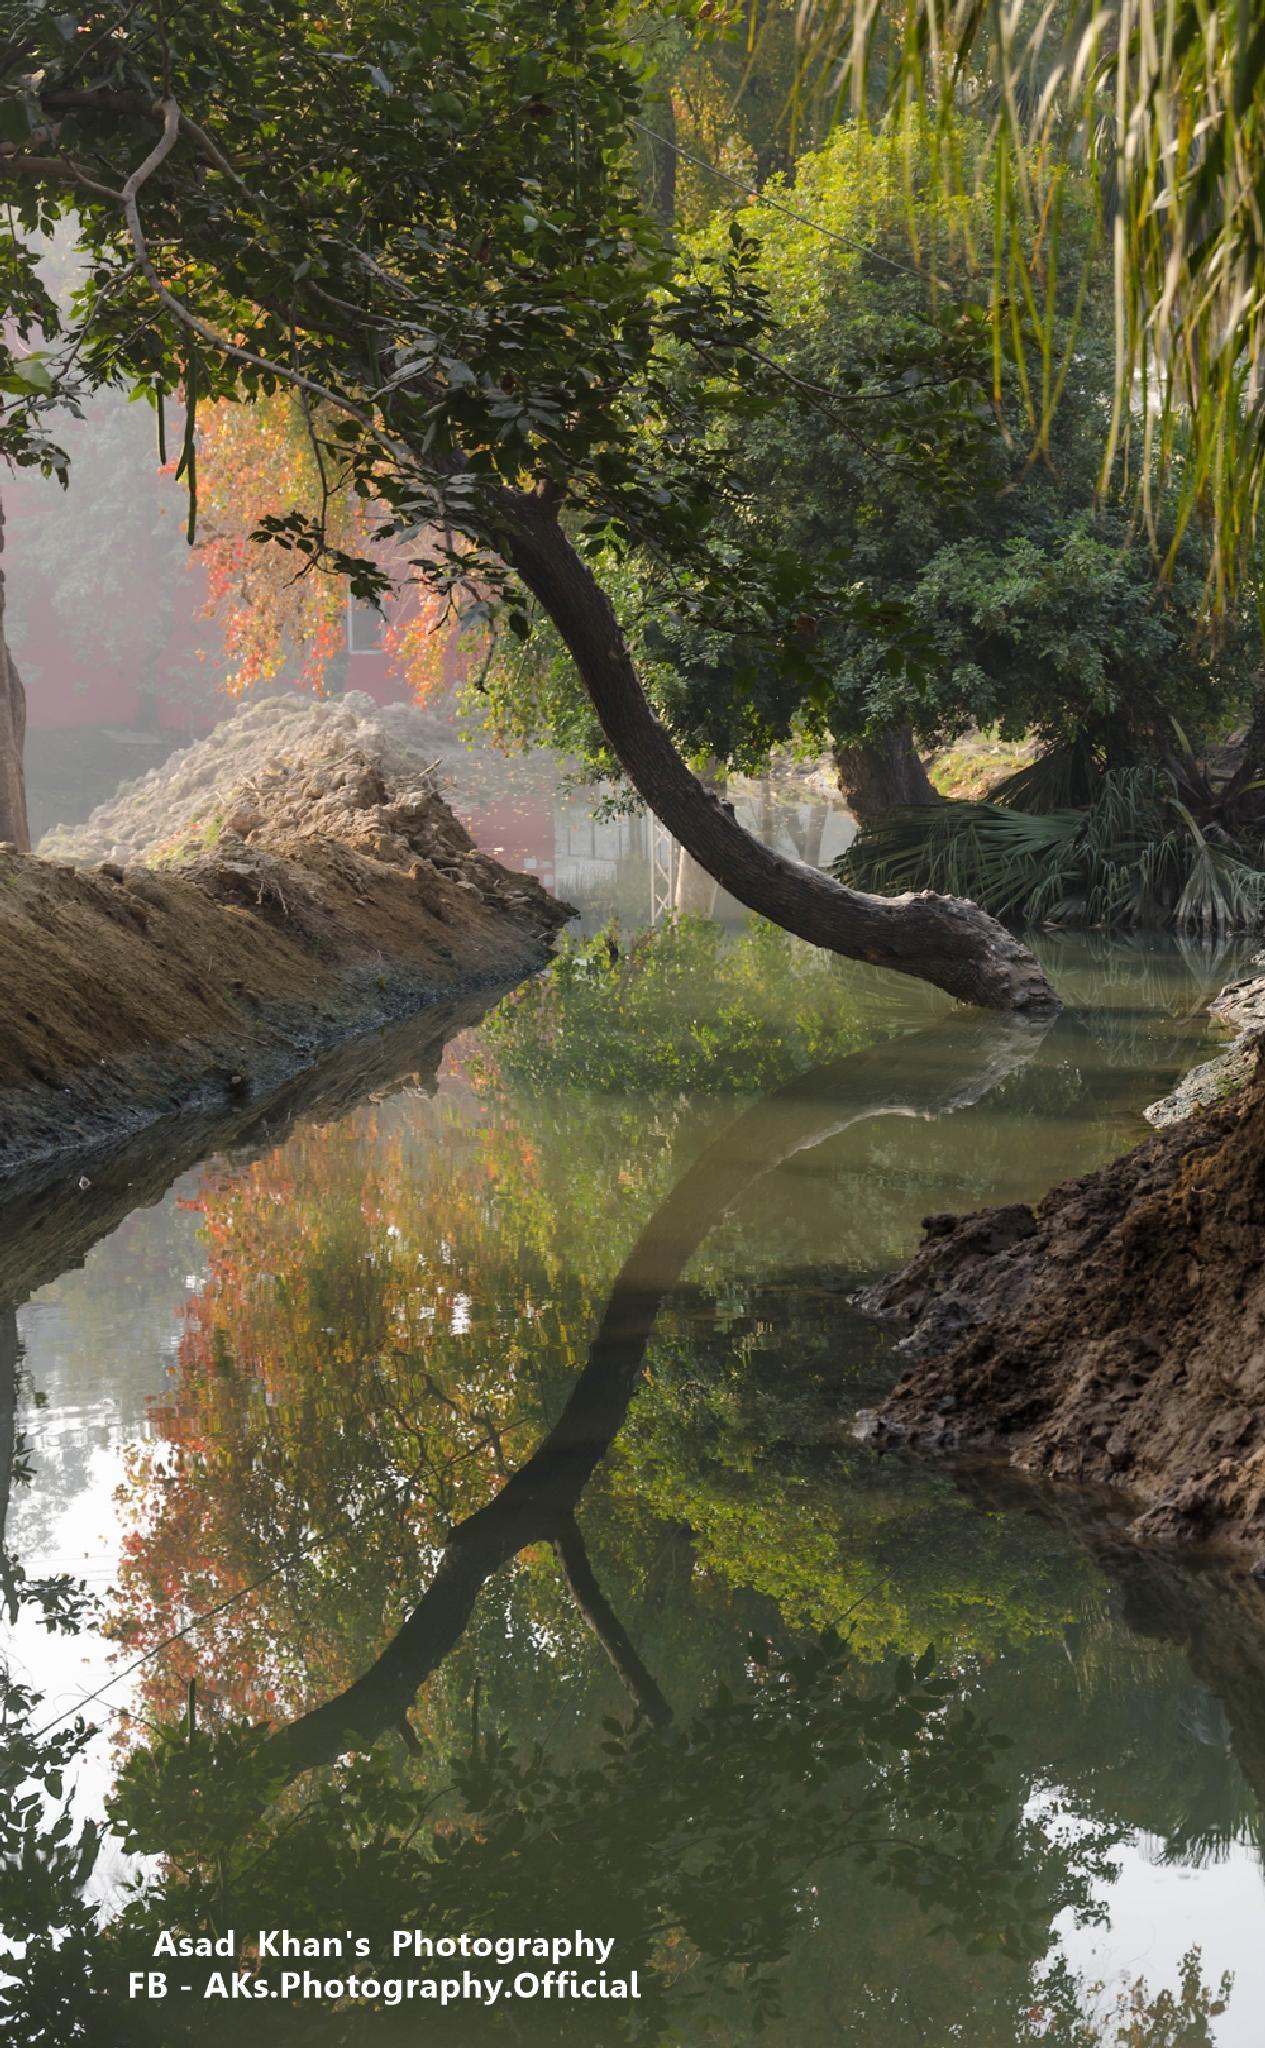 Reflection by Muhammad Asad Khan